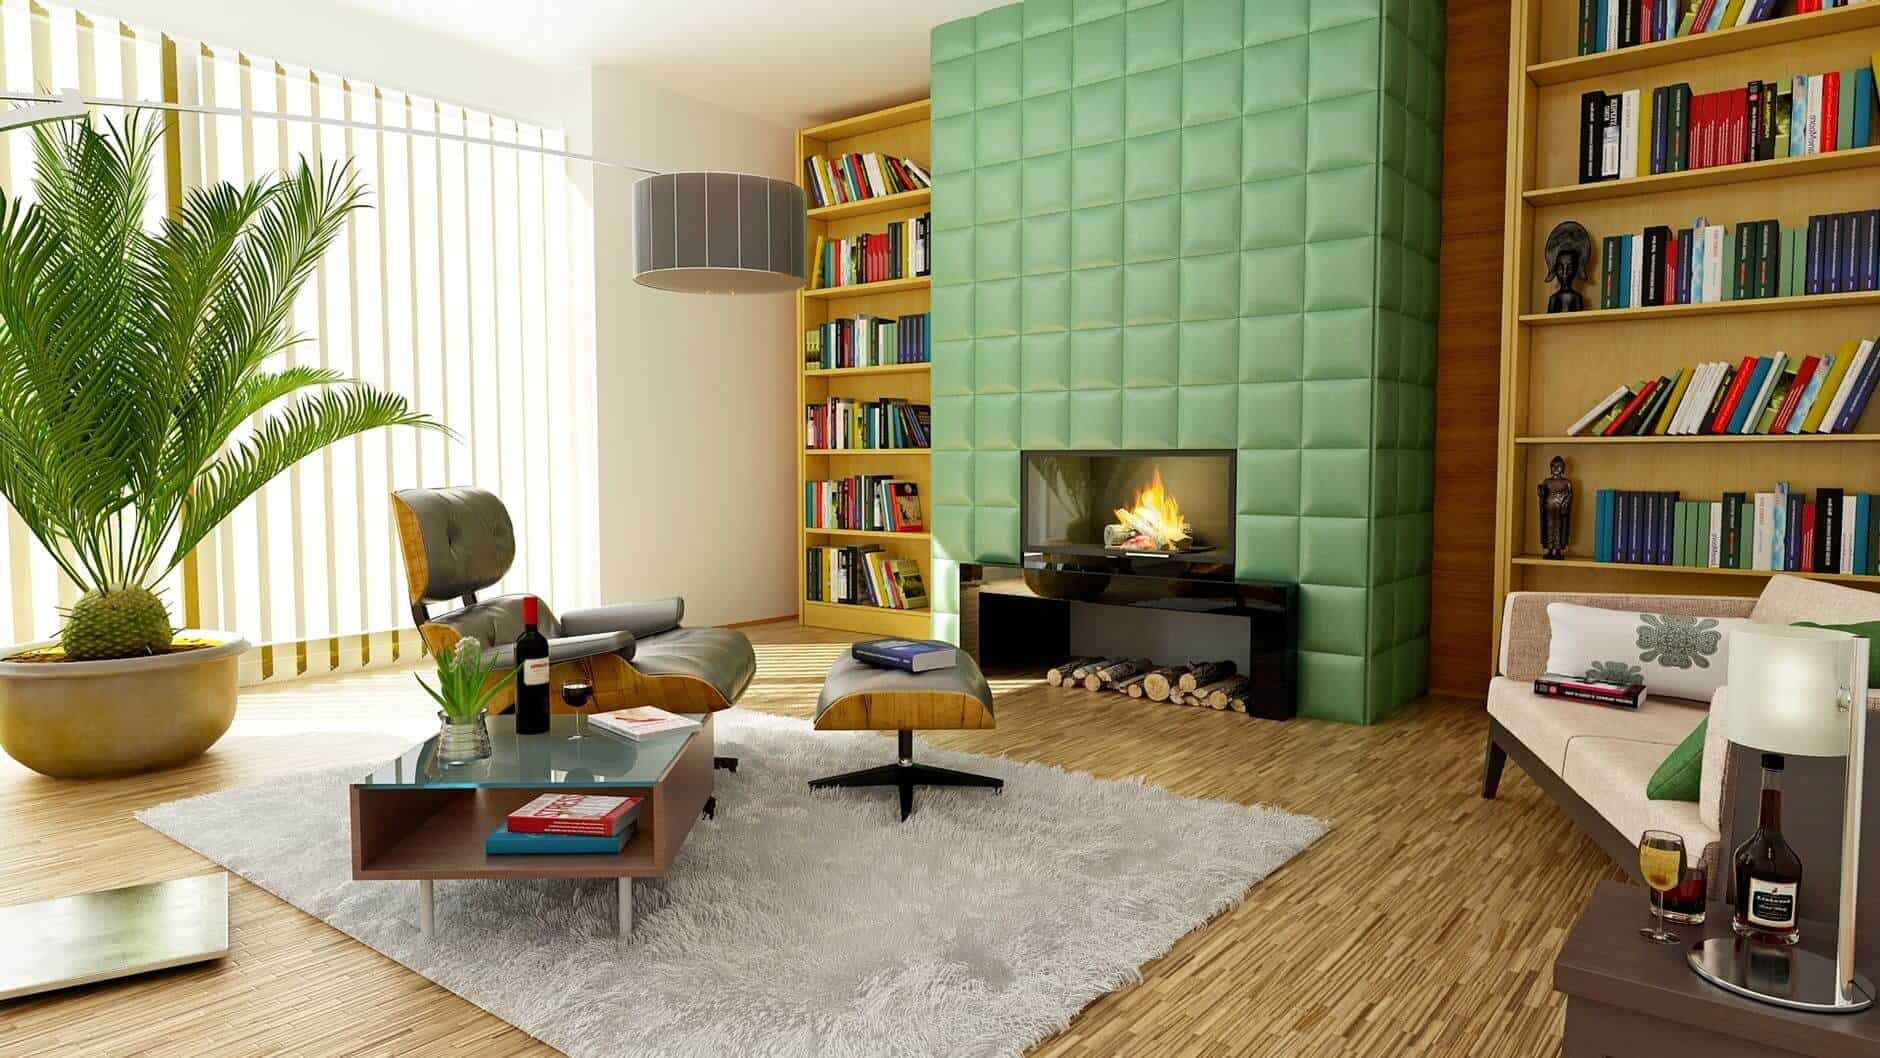 Rug Designs For Living Room 11